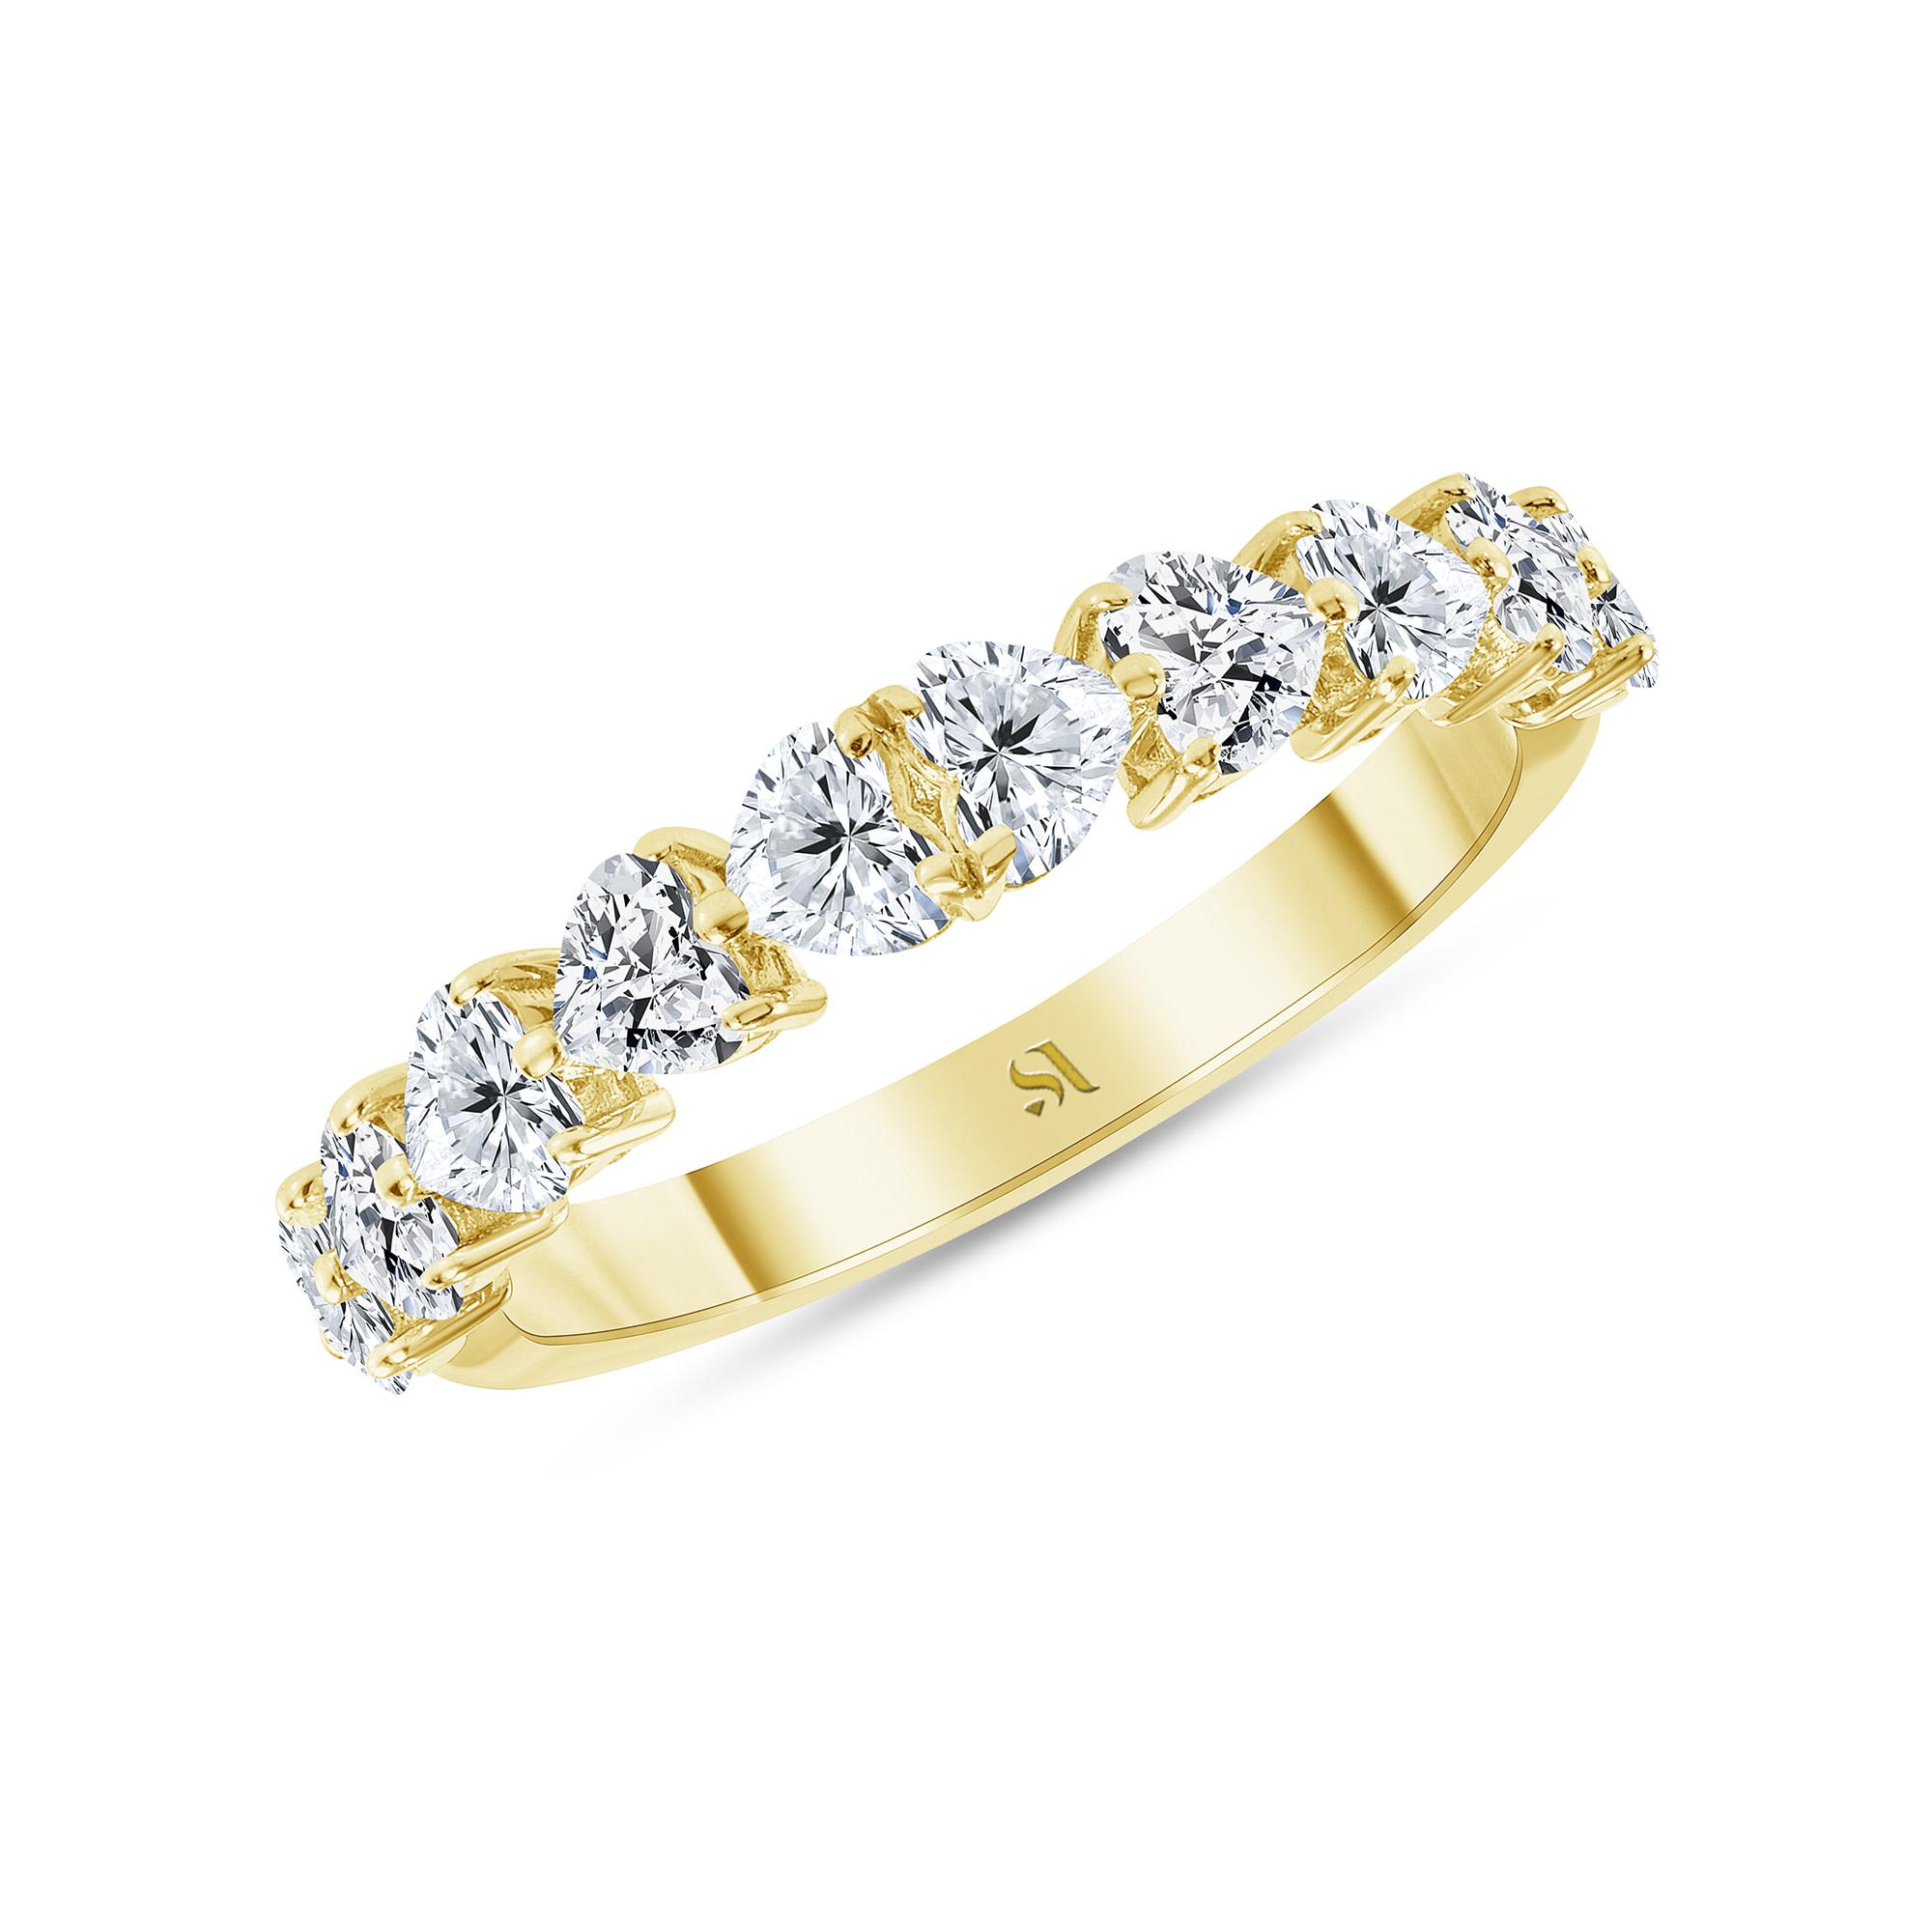 Half heart shaped diamond ring gold